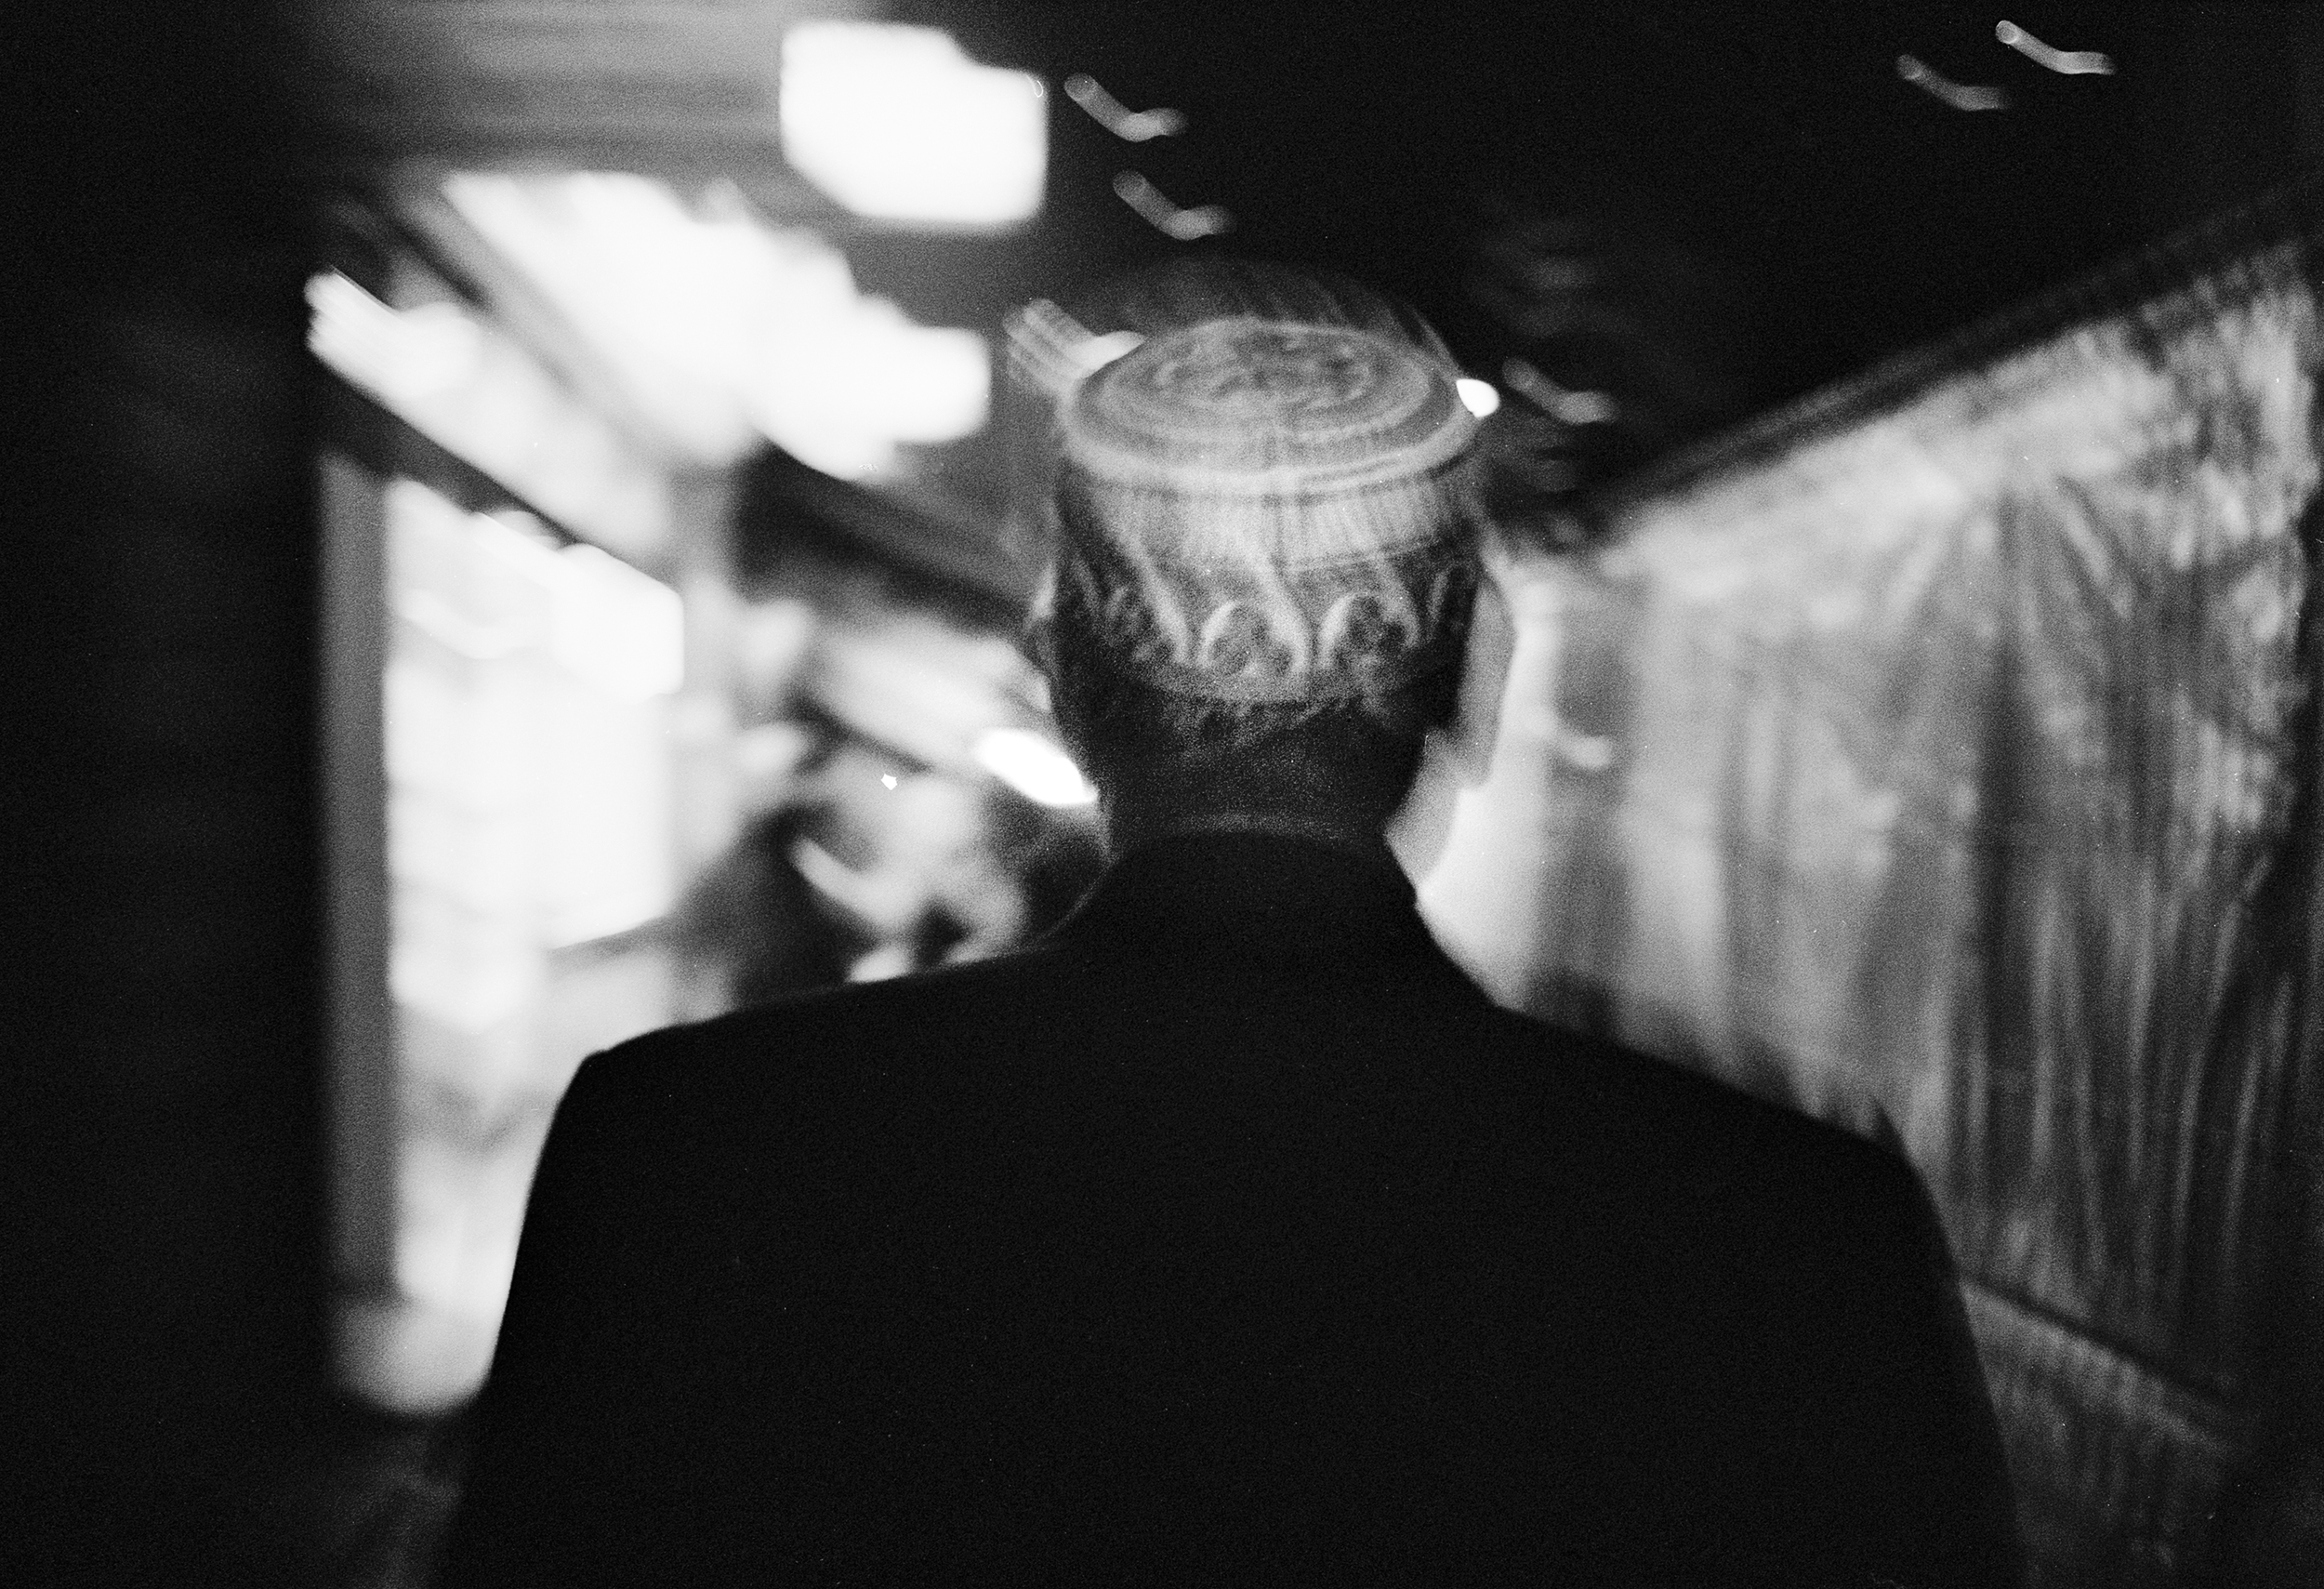 Oscar-arribas-photography-fotografo-portrait-retrato-editorial-london-street-photography-urbana-londres-film-analog-35mm-night-nocturna-53.jpg